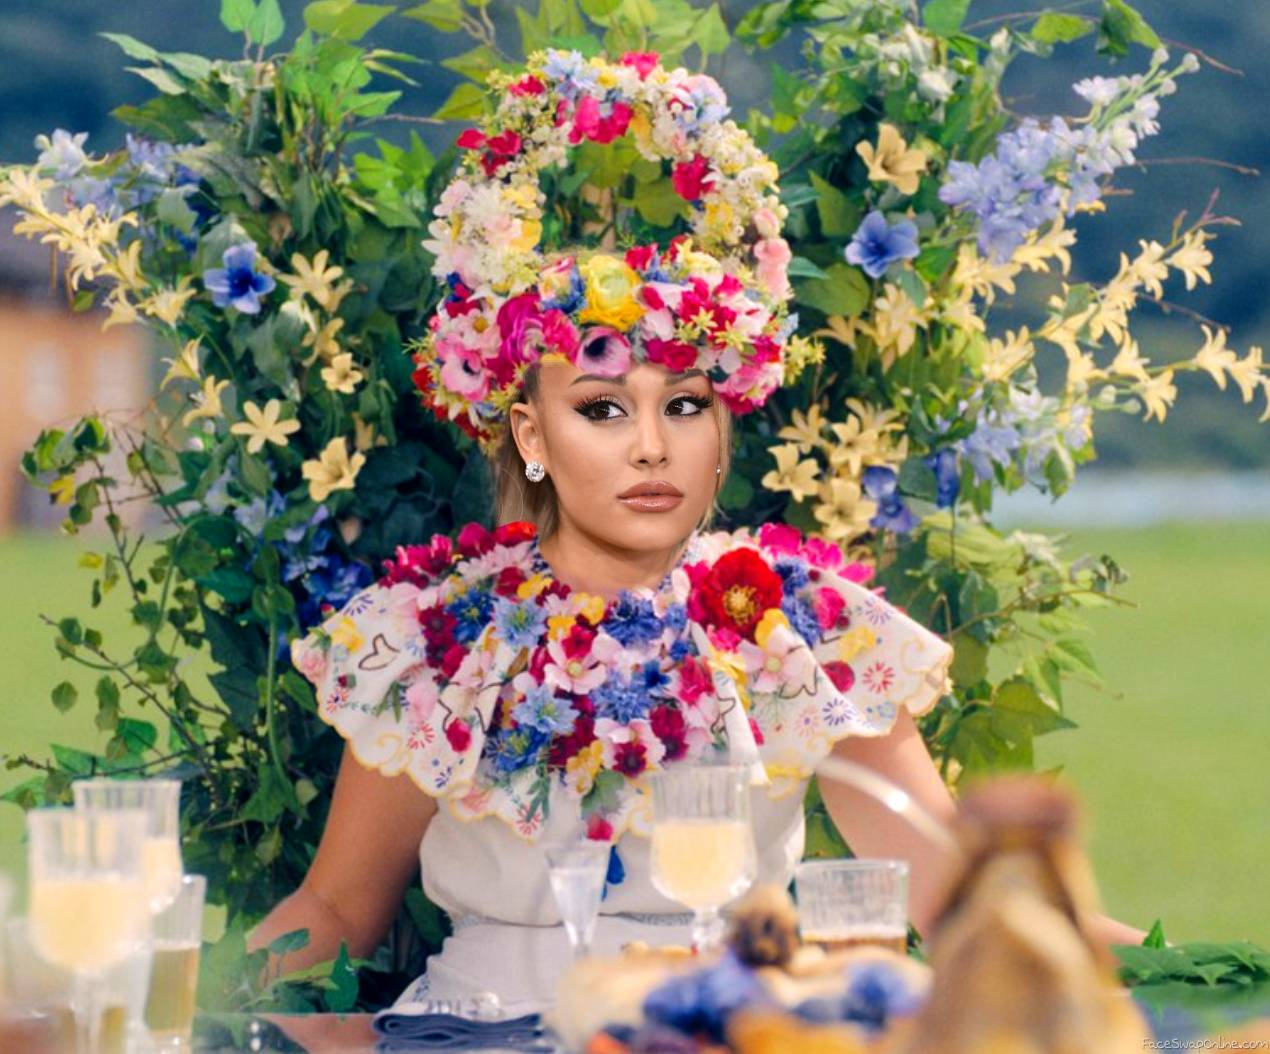 Ariana Grande in Midsommar dress